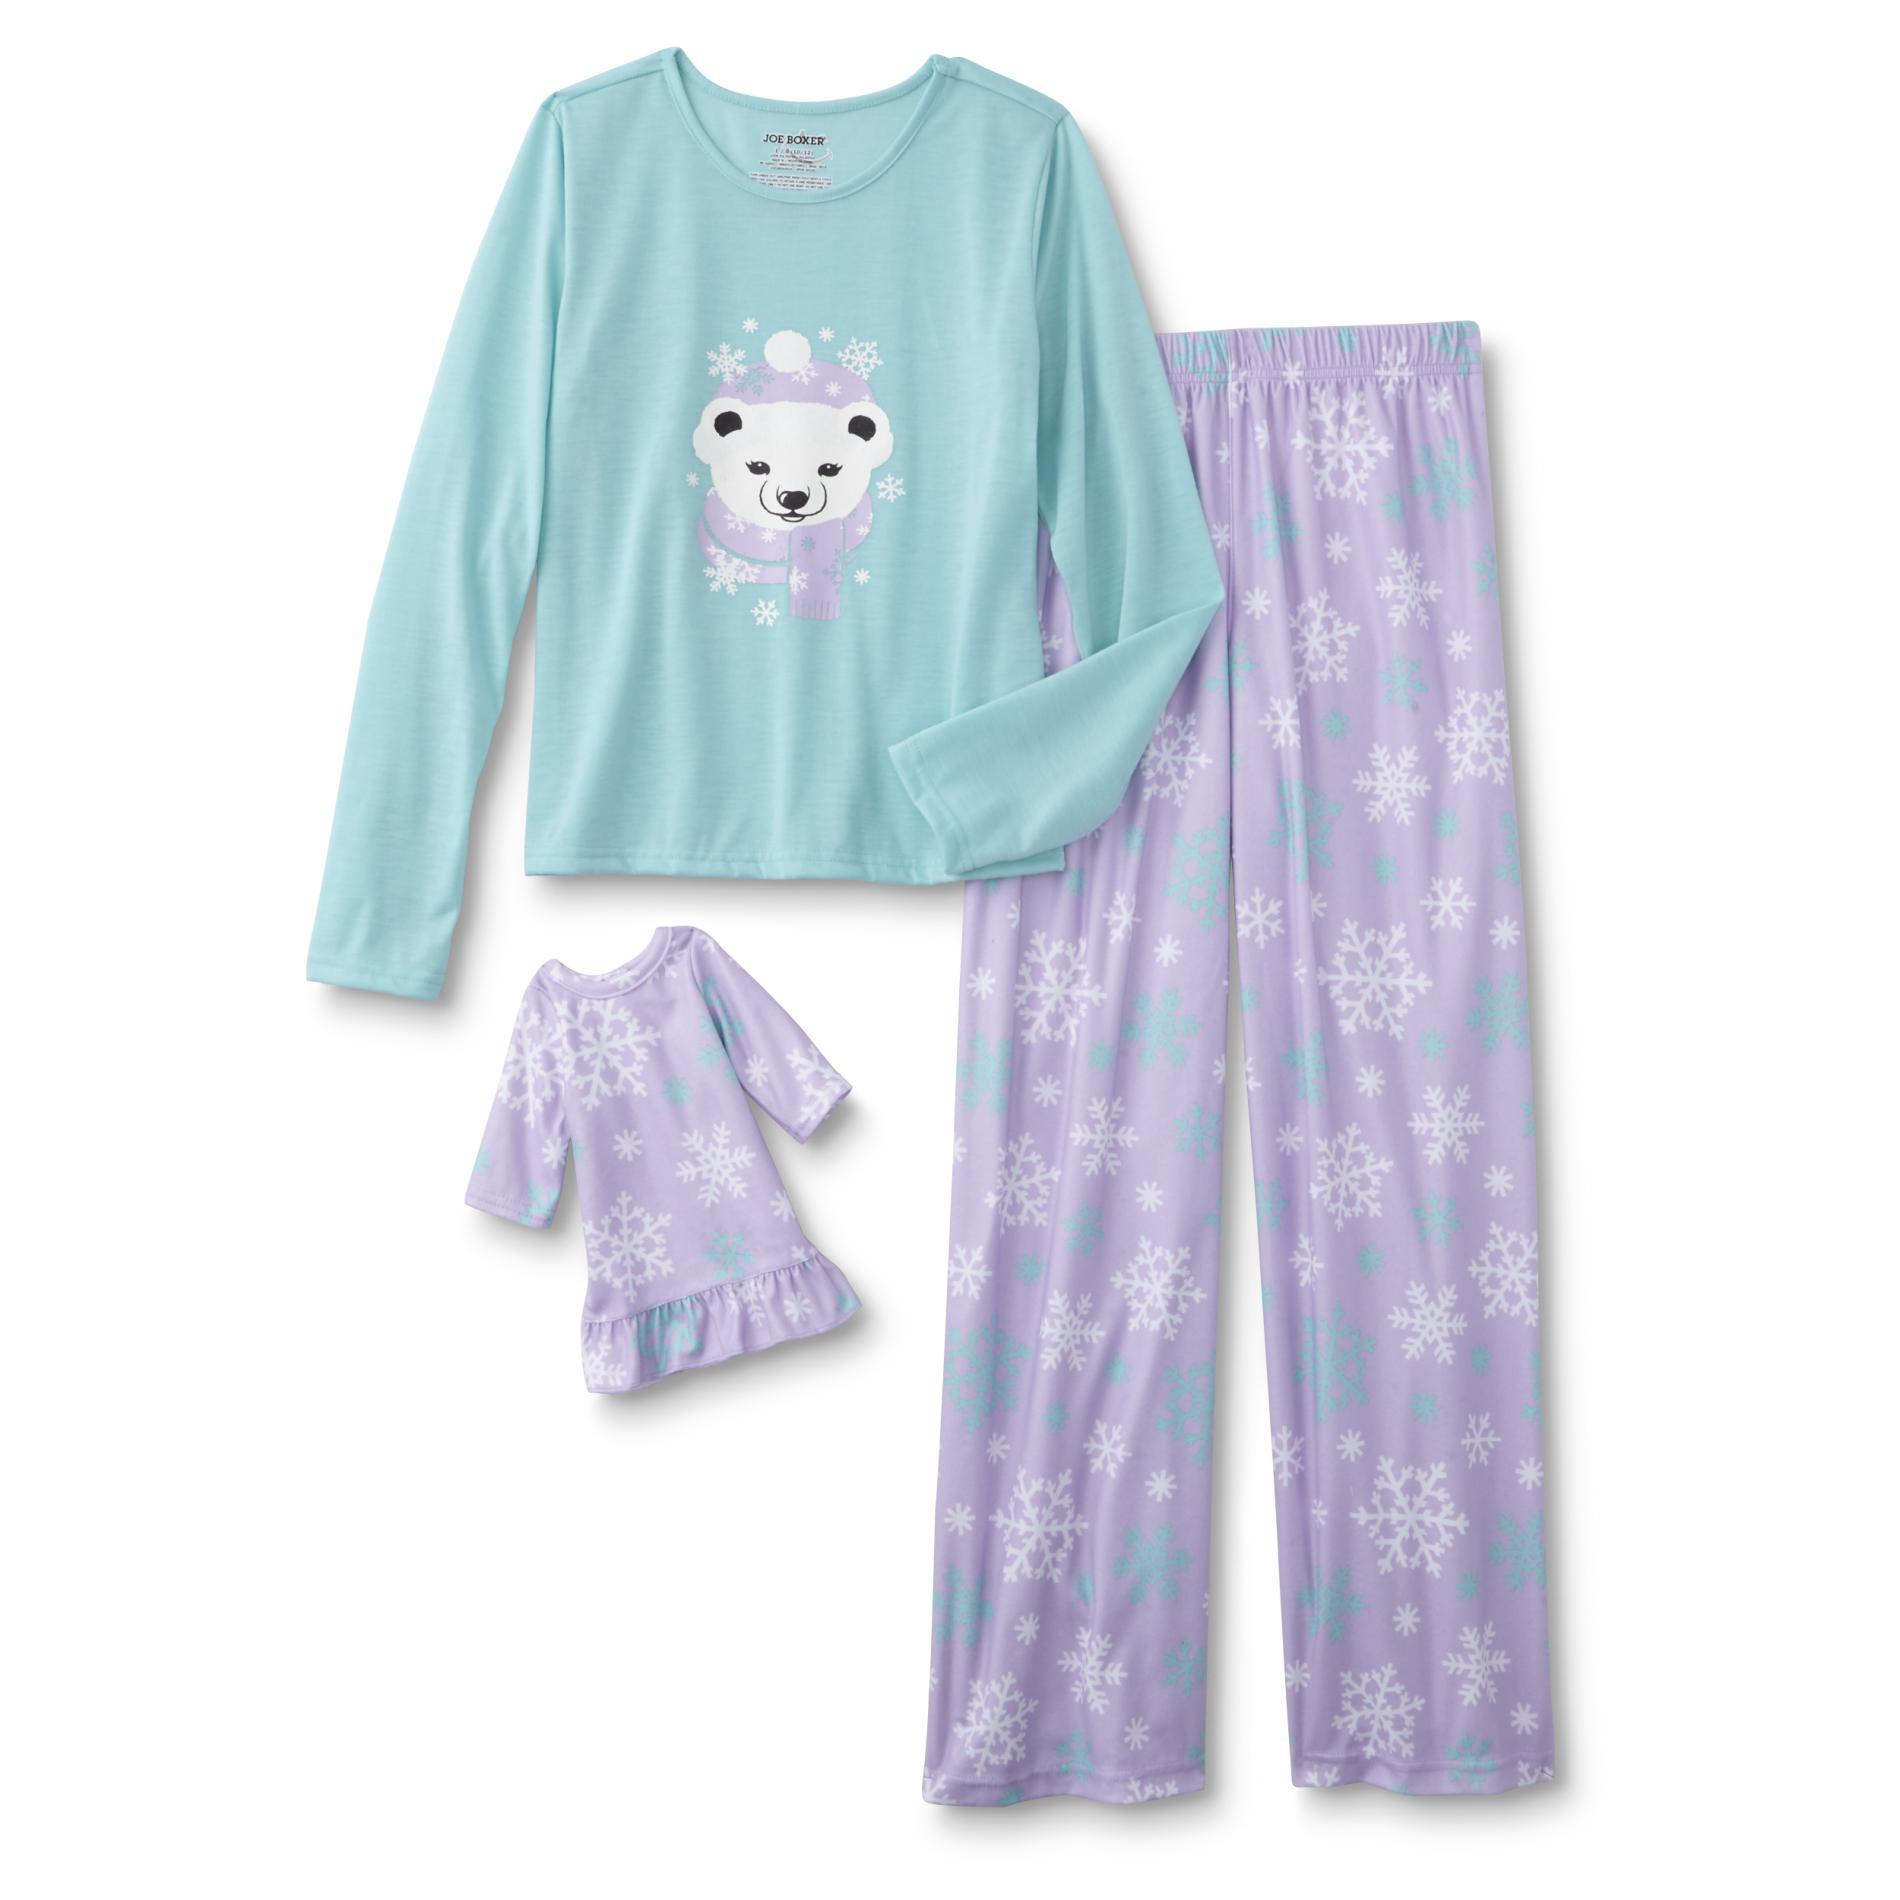 Girls' Pajama Top, Pants & Doll Nightgown - Polar Bear